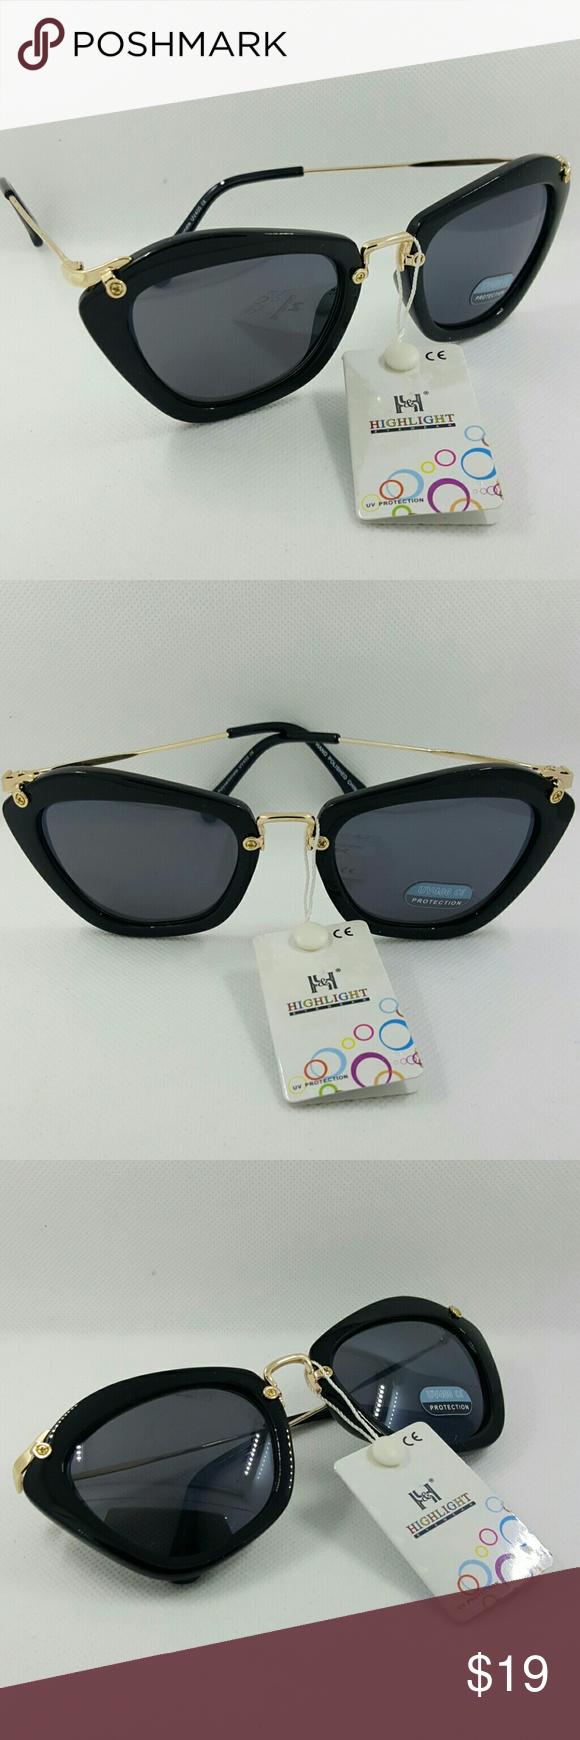 CAT DESIGNER STYLE FASHION SUNGLASSES CAT DESIGNER STYLE FASHION  SUNGLASSES Accessories Sunglasses